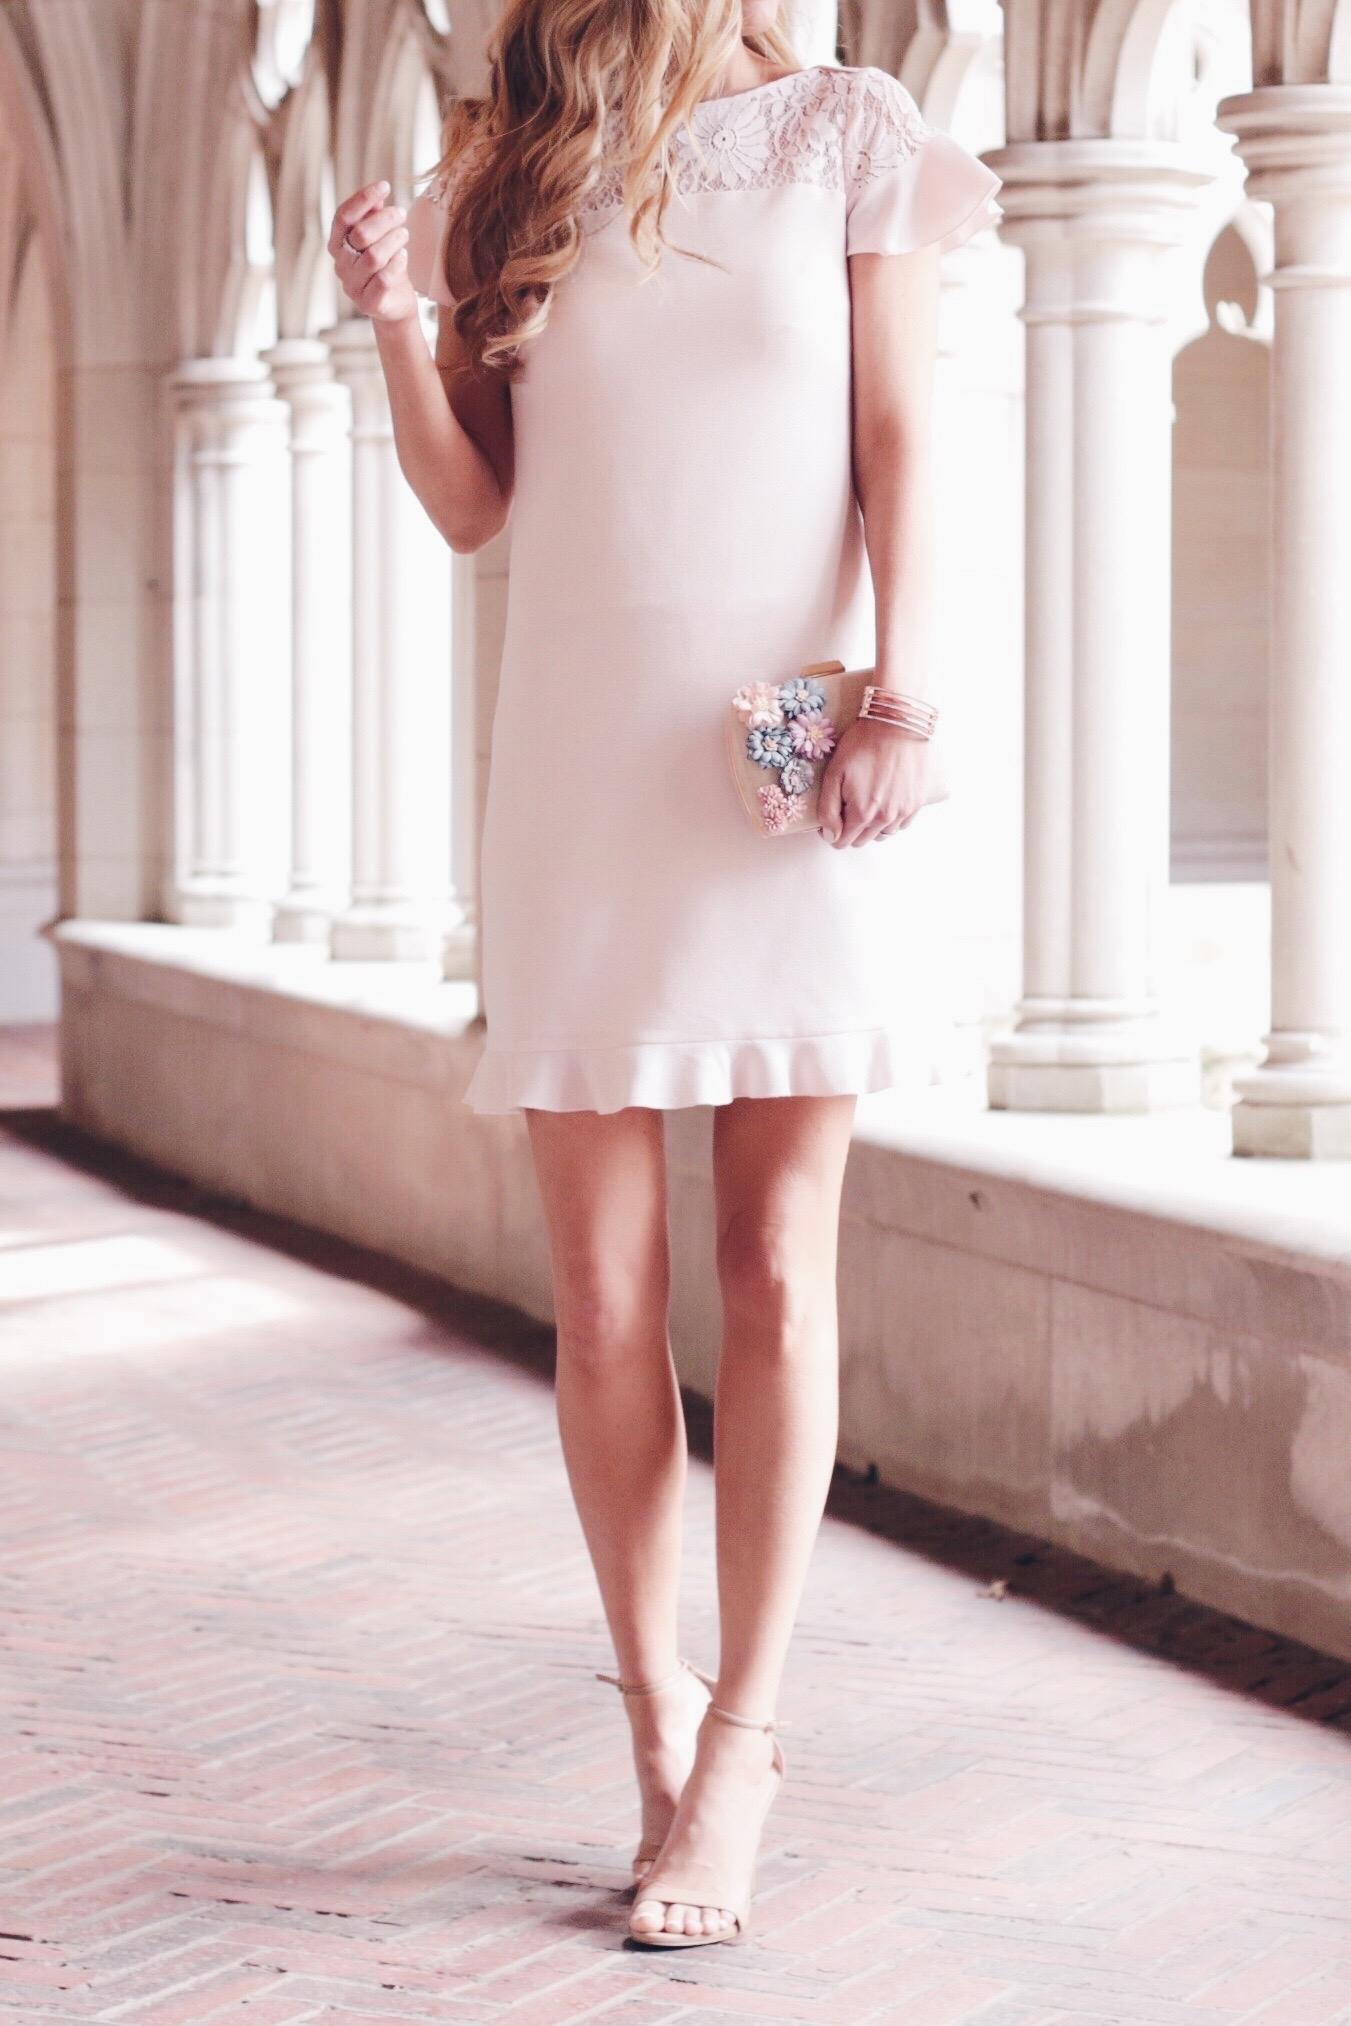 spring wedding guest dresses - pale pink ruffle hem option on pinteresting plans fashion blog